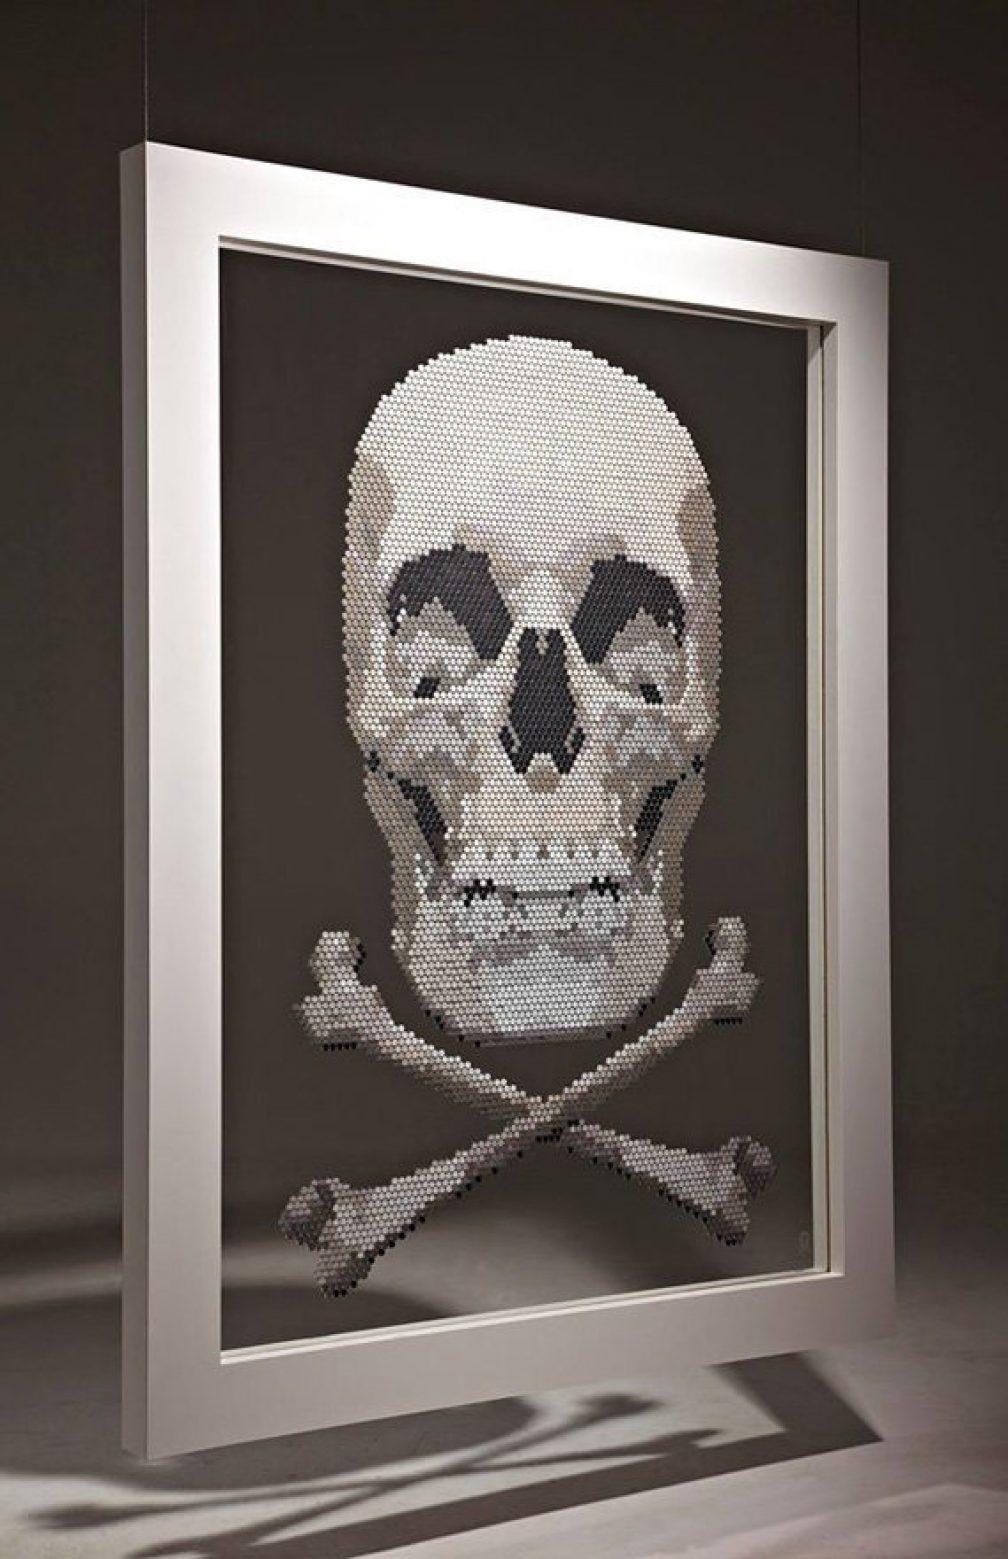 Pinger art: 14 of the best ecstasy artworks - Blog - Mixmag